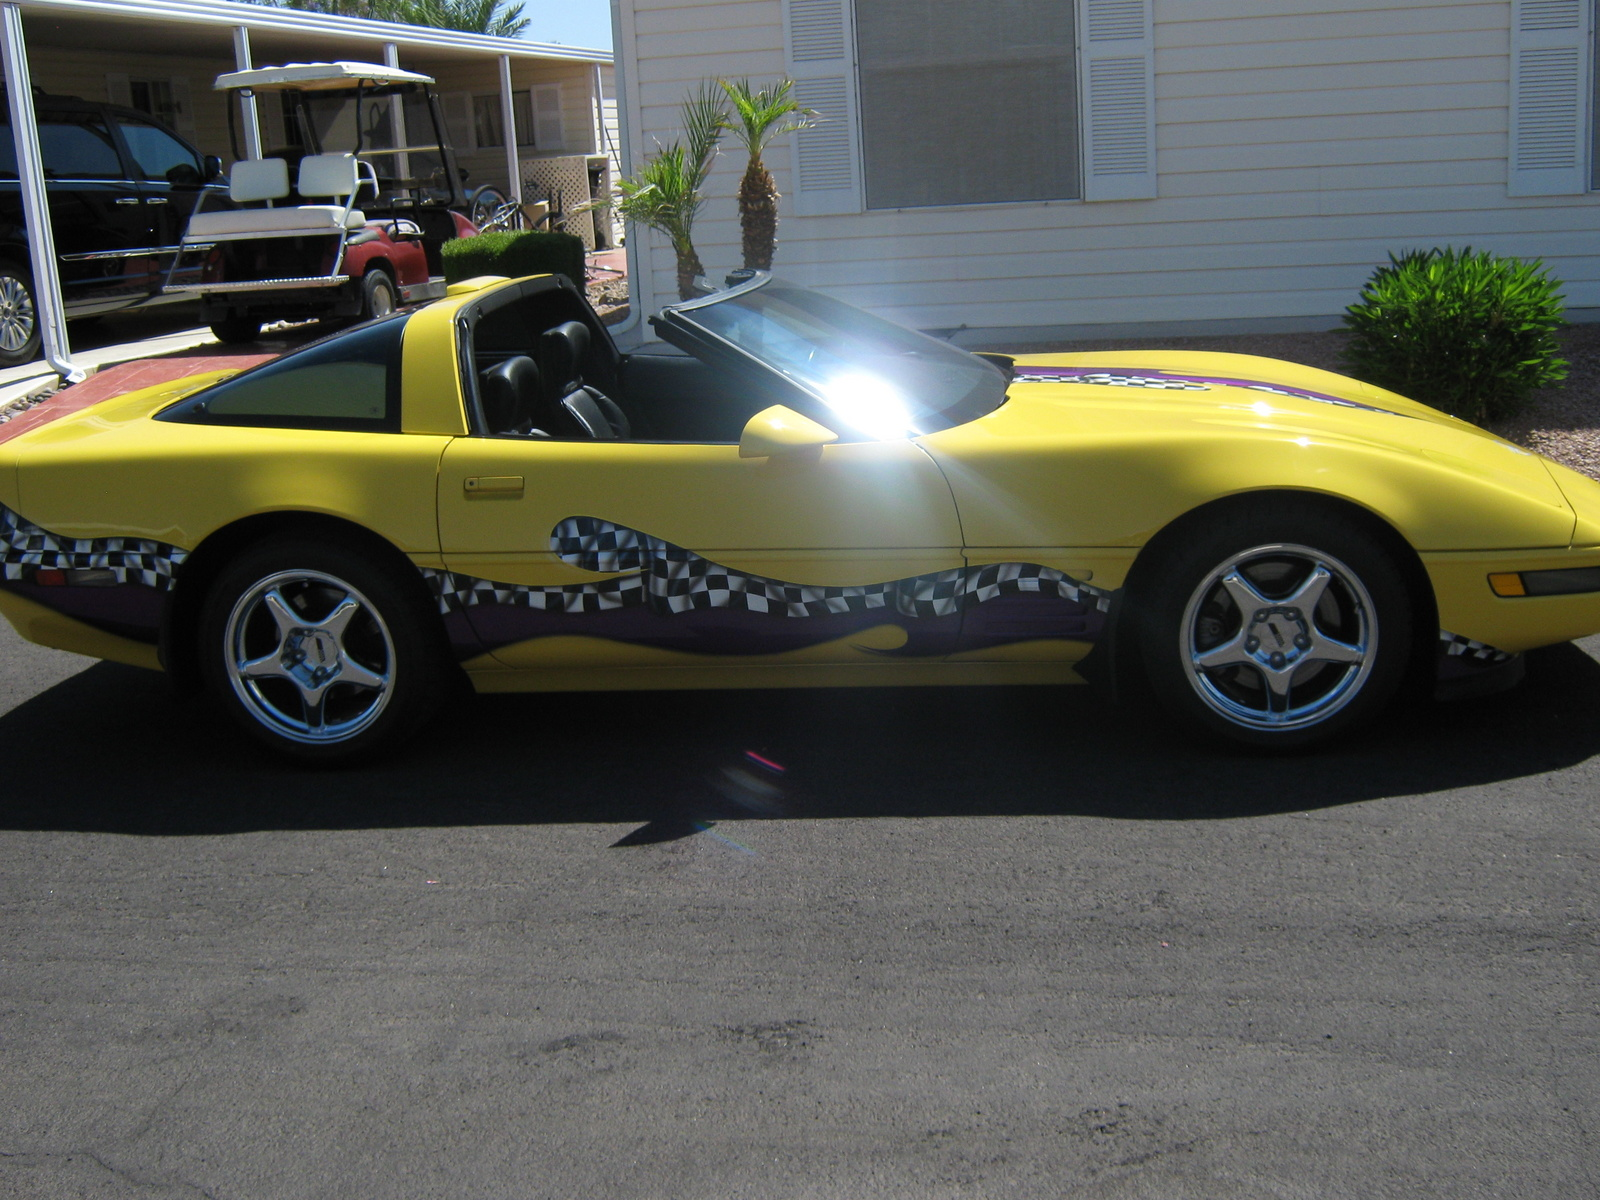 Wiring Diagram 1991 Chevy Corvette Schematics Diagrams 1986 Seat Engine Also Volt As Well Chevrolet 1979 Pdf Power Antenna